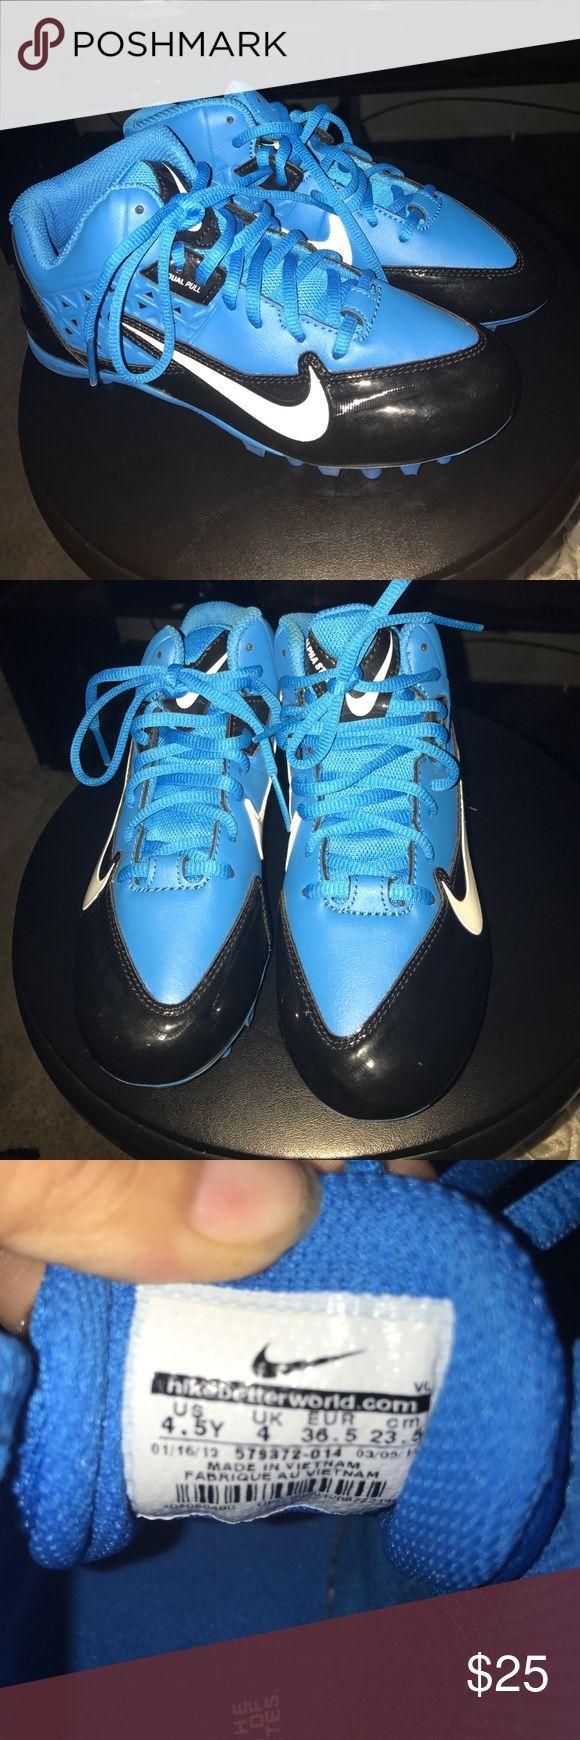 Nike alpha strike cleats Blue and black Nike alpha strike youth cleats , size 4.5 youth. NWOT, never worn . Football cleats Nike Other